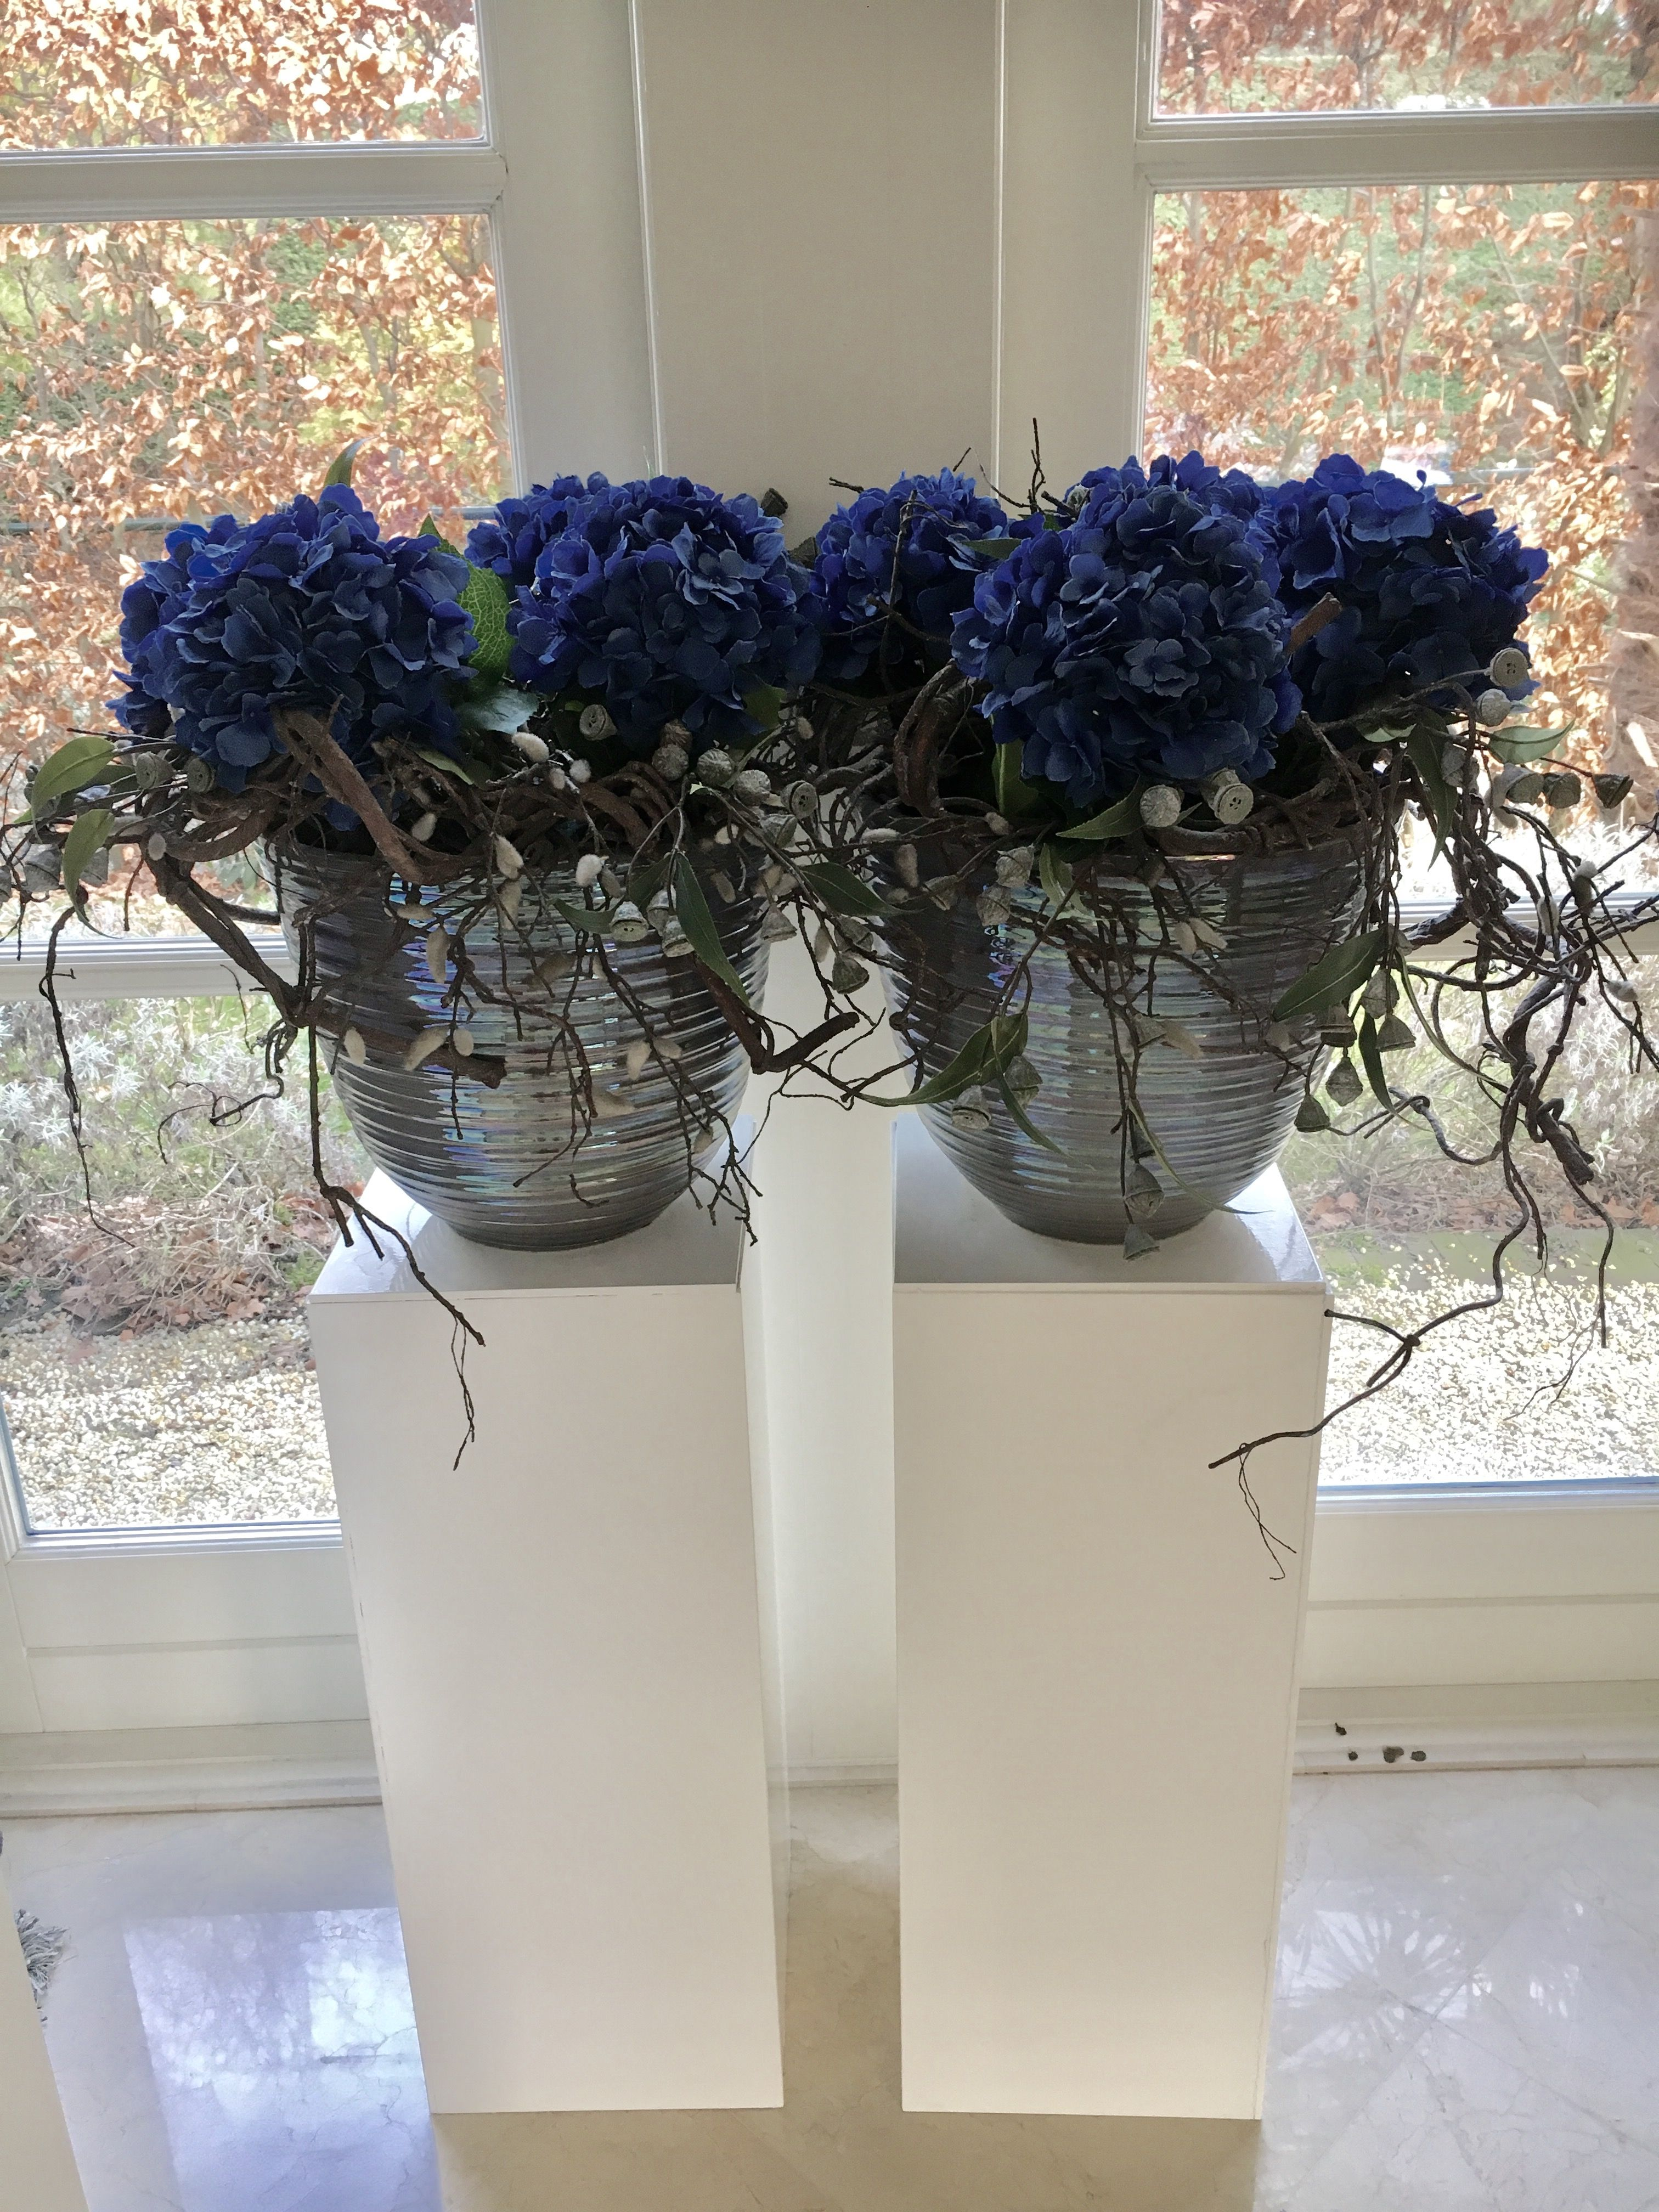 Close to real! Blauwe hortensia's met eucalyptus in pot op sokkel!